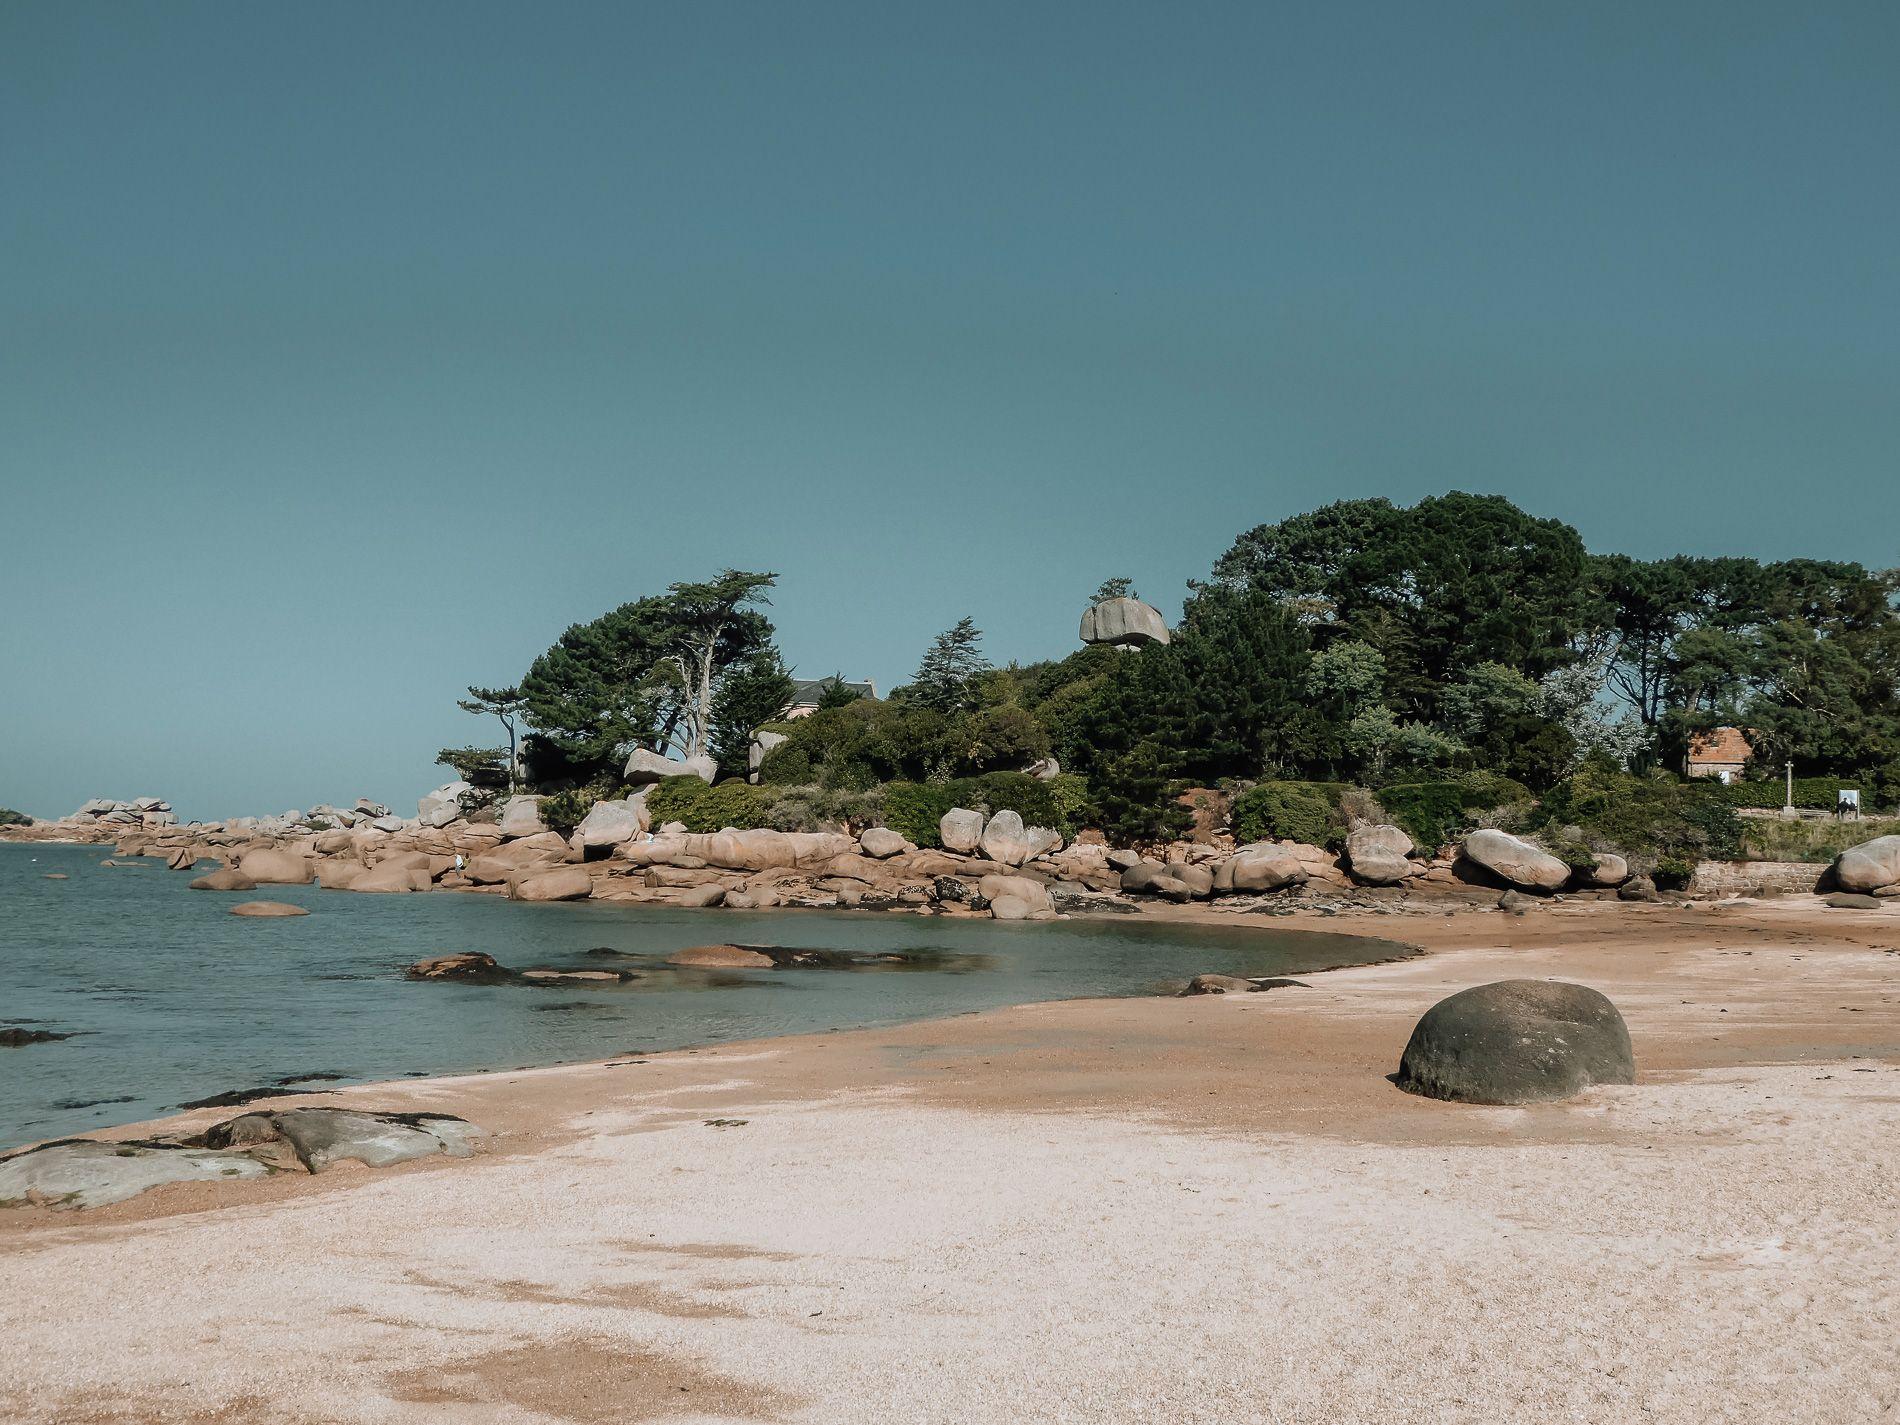 Bretagne - cote de granit rose - conseils - mademoiselle - voyage - blog - tregastel